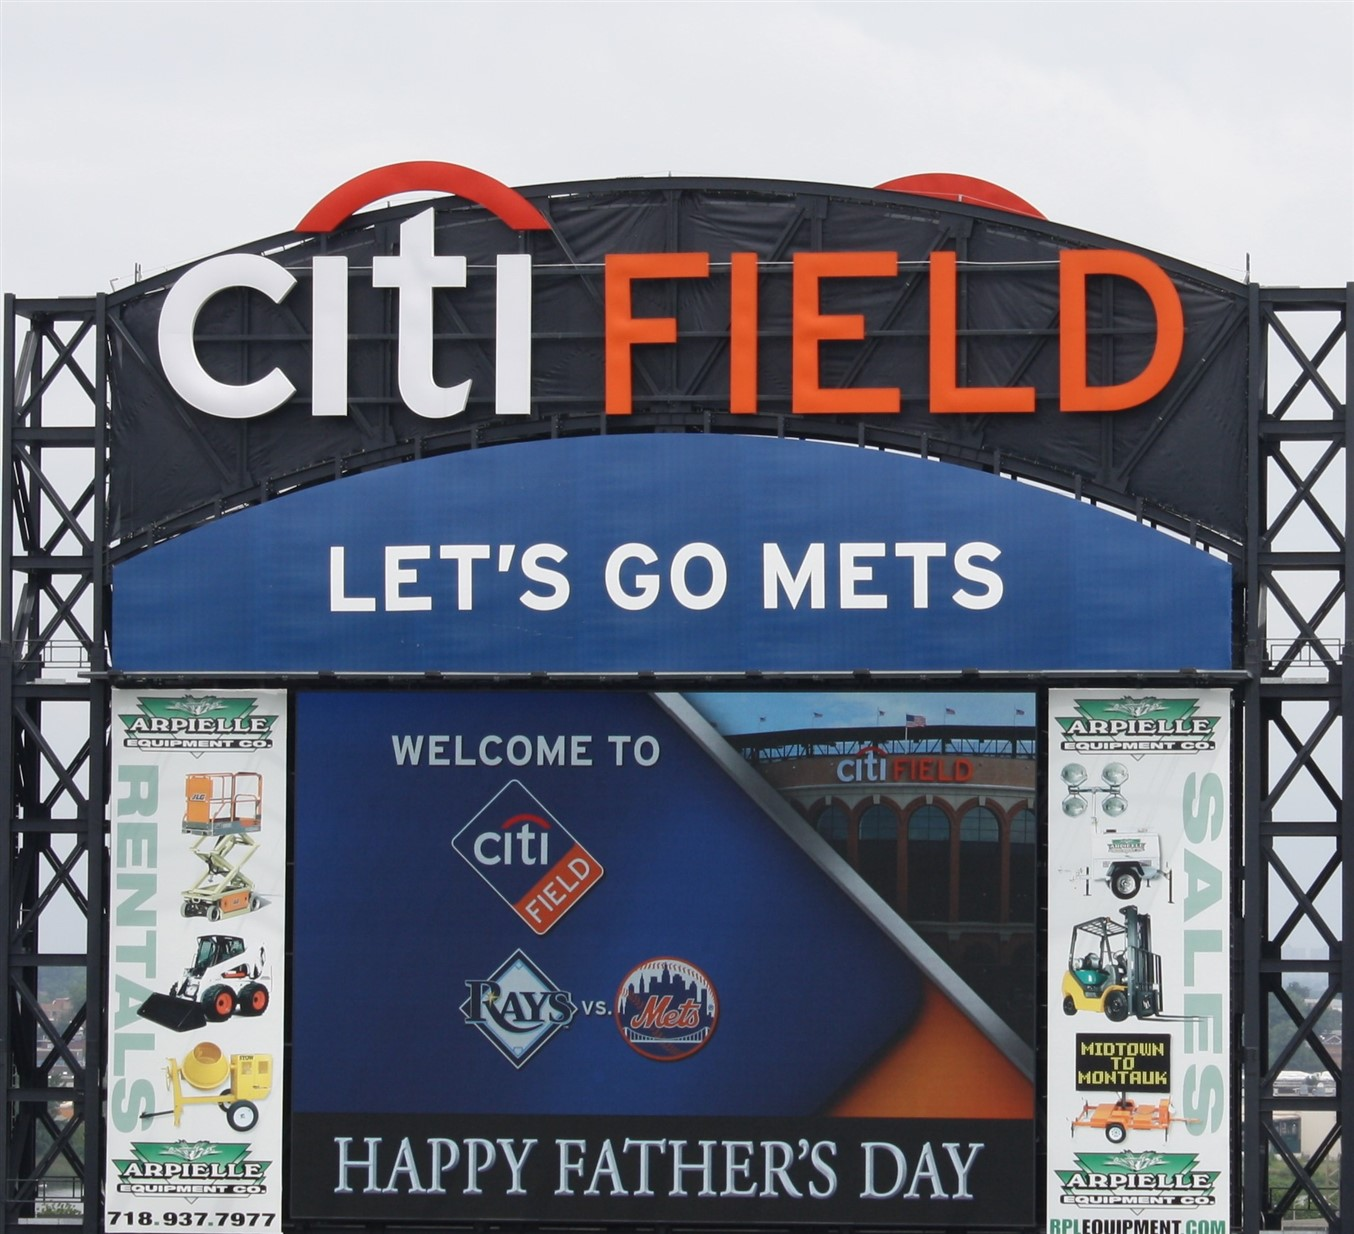 2009 06 21 Law School Road Trip Day 6 New York Mets 81.jpg